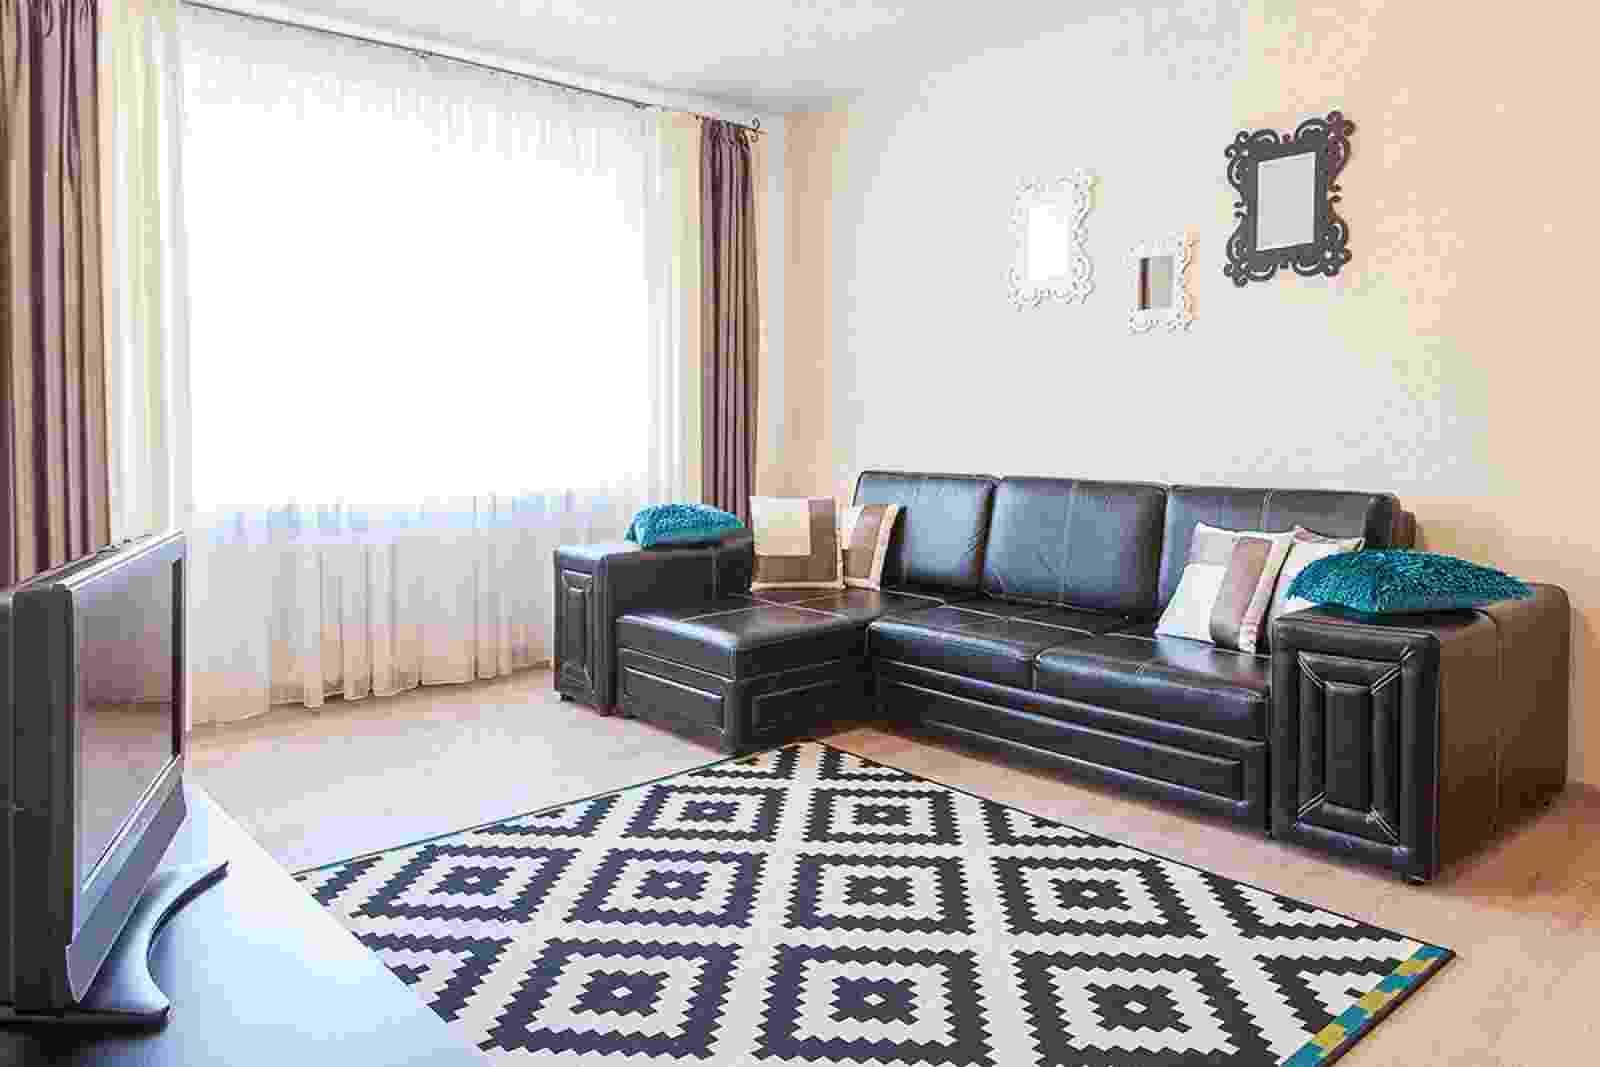 1-2-3 комнатные апартаменты в центре